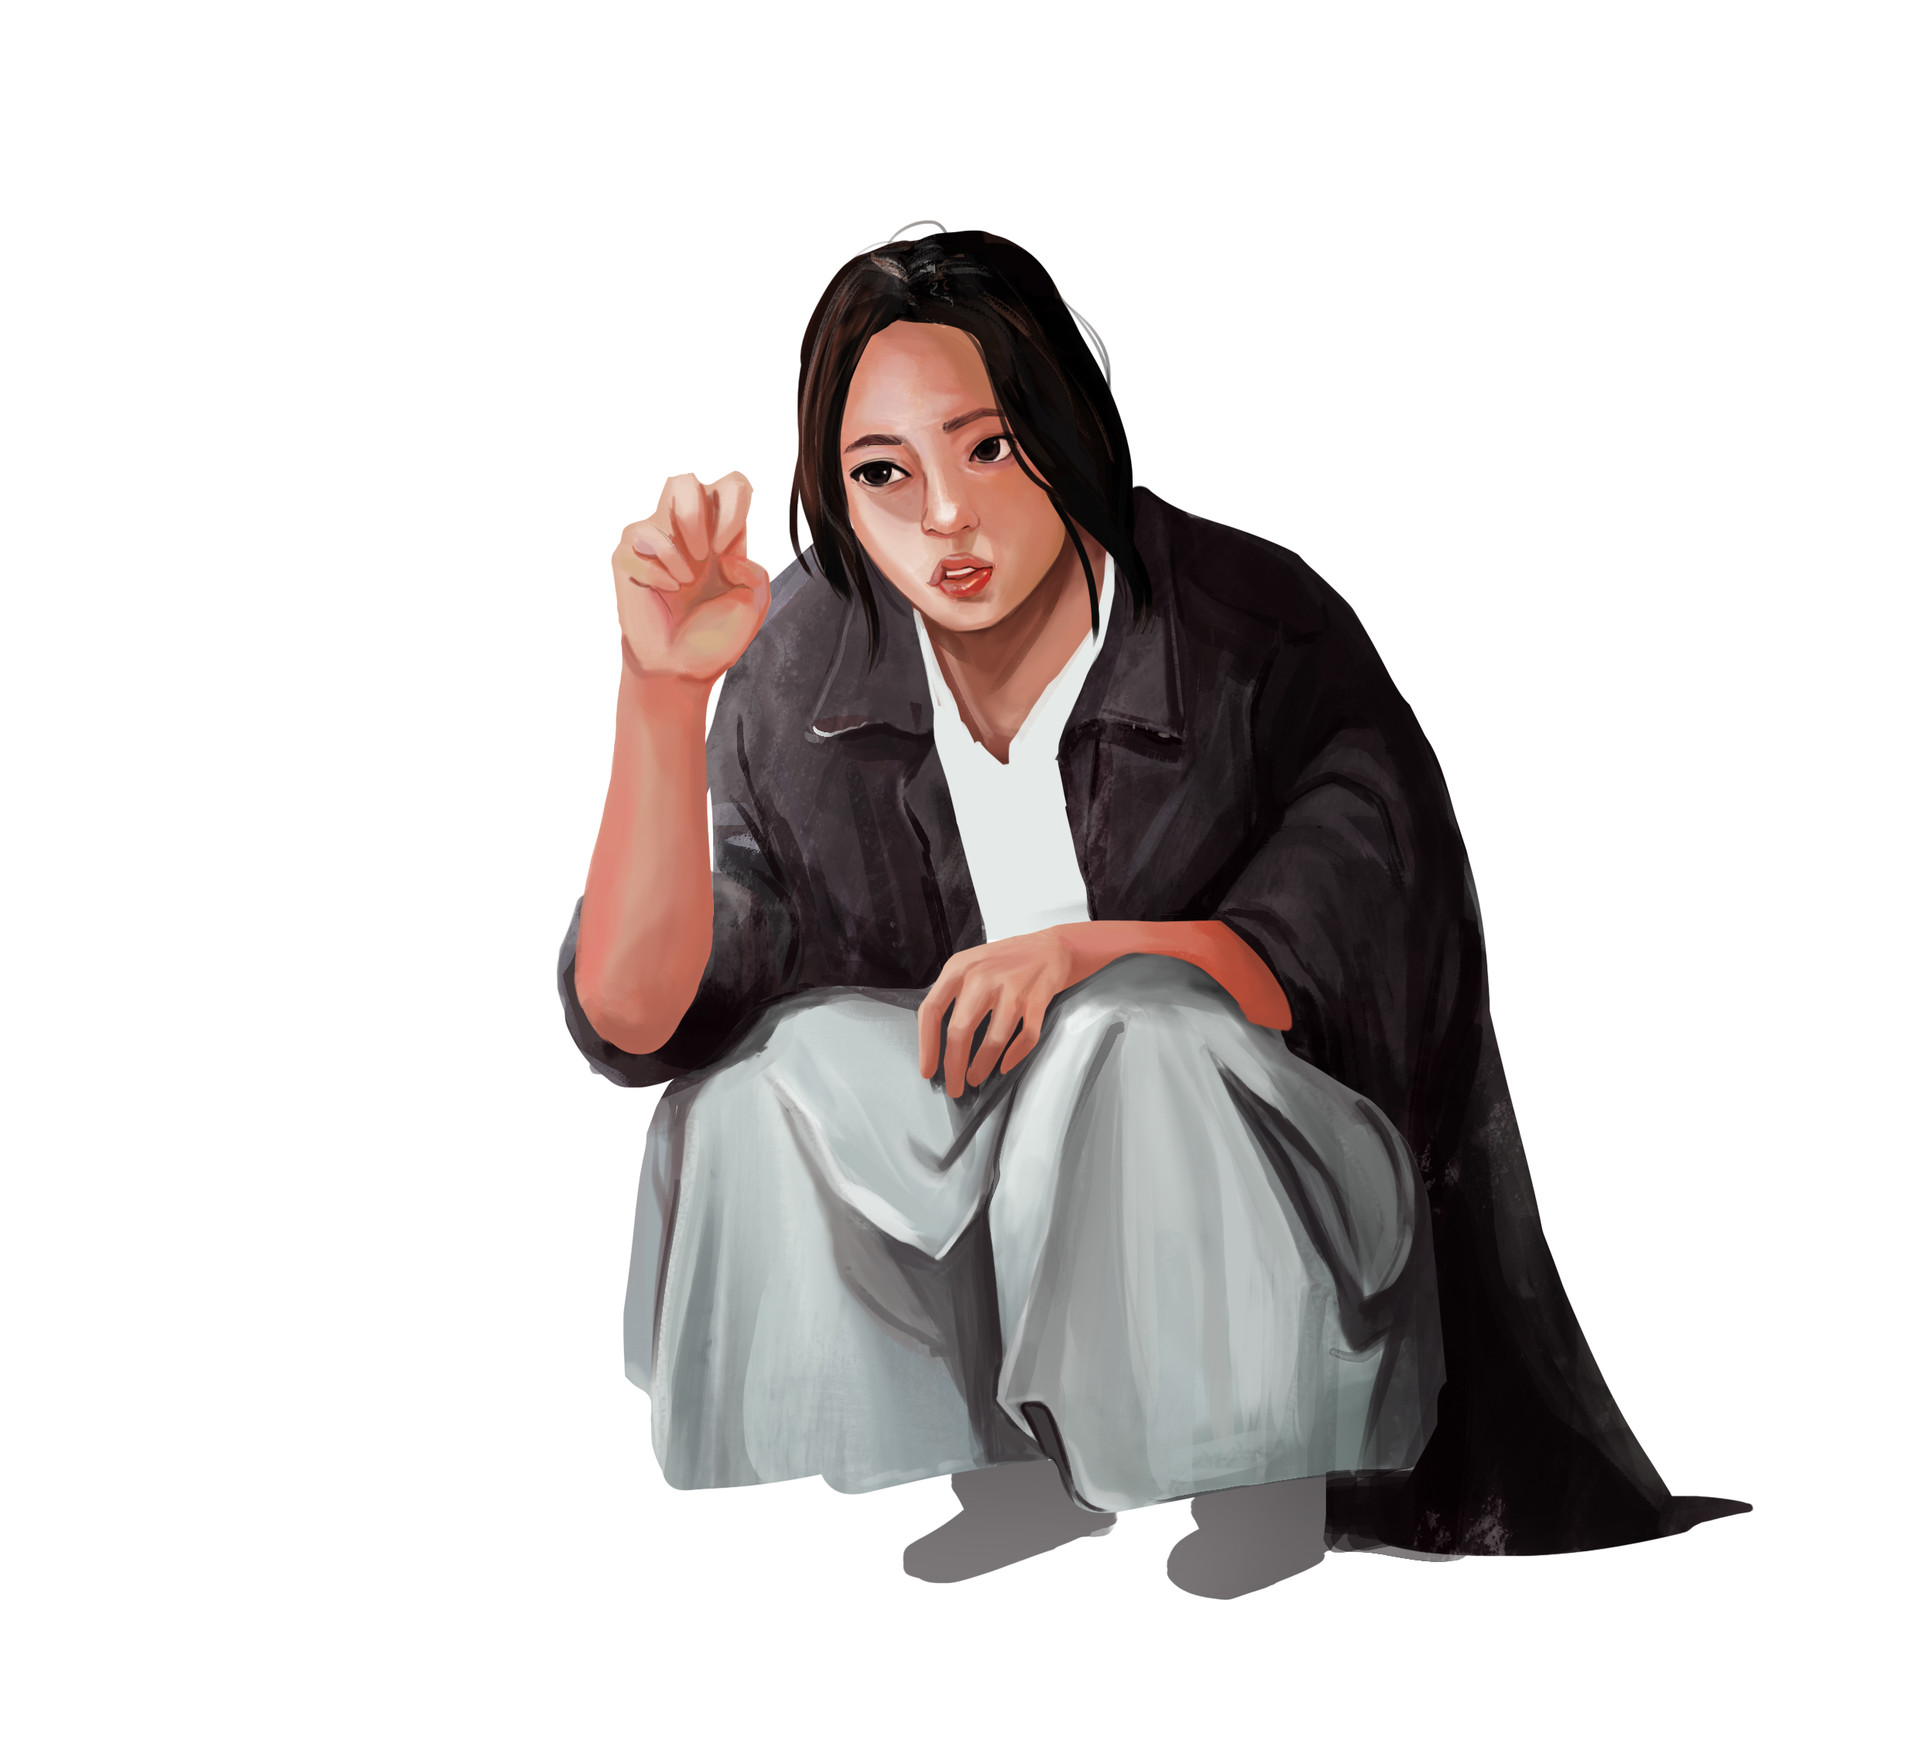 Seungyeop lee